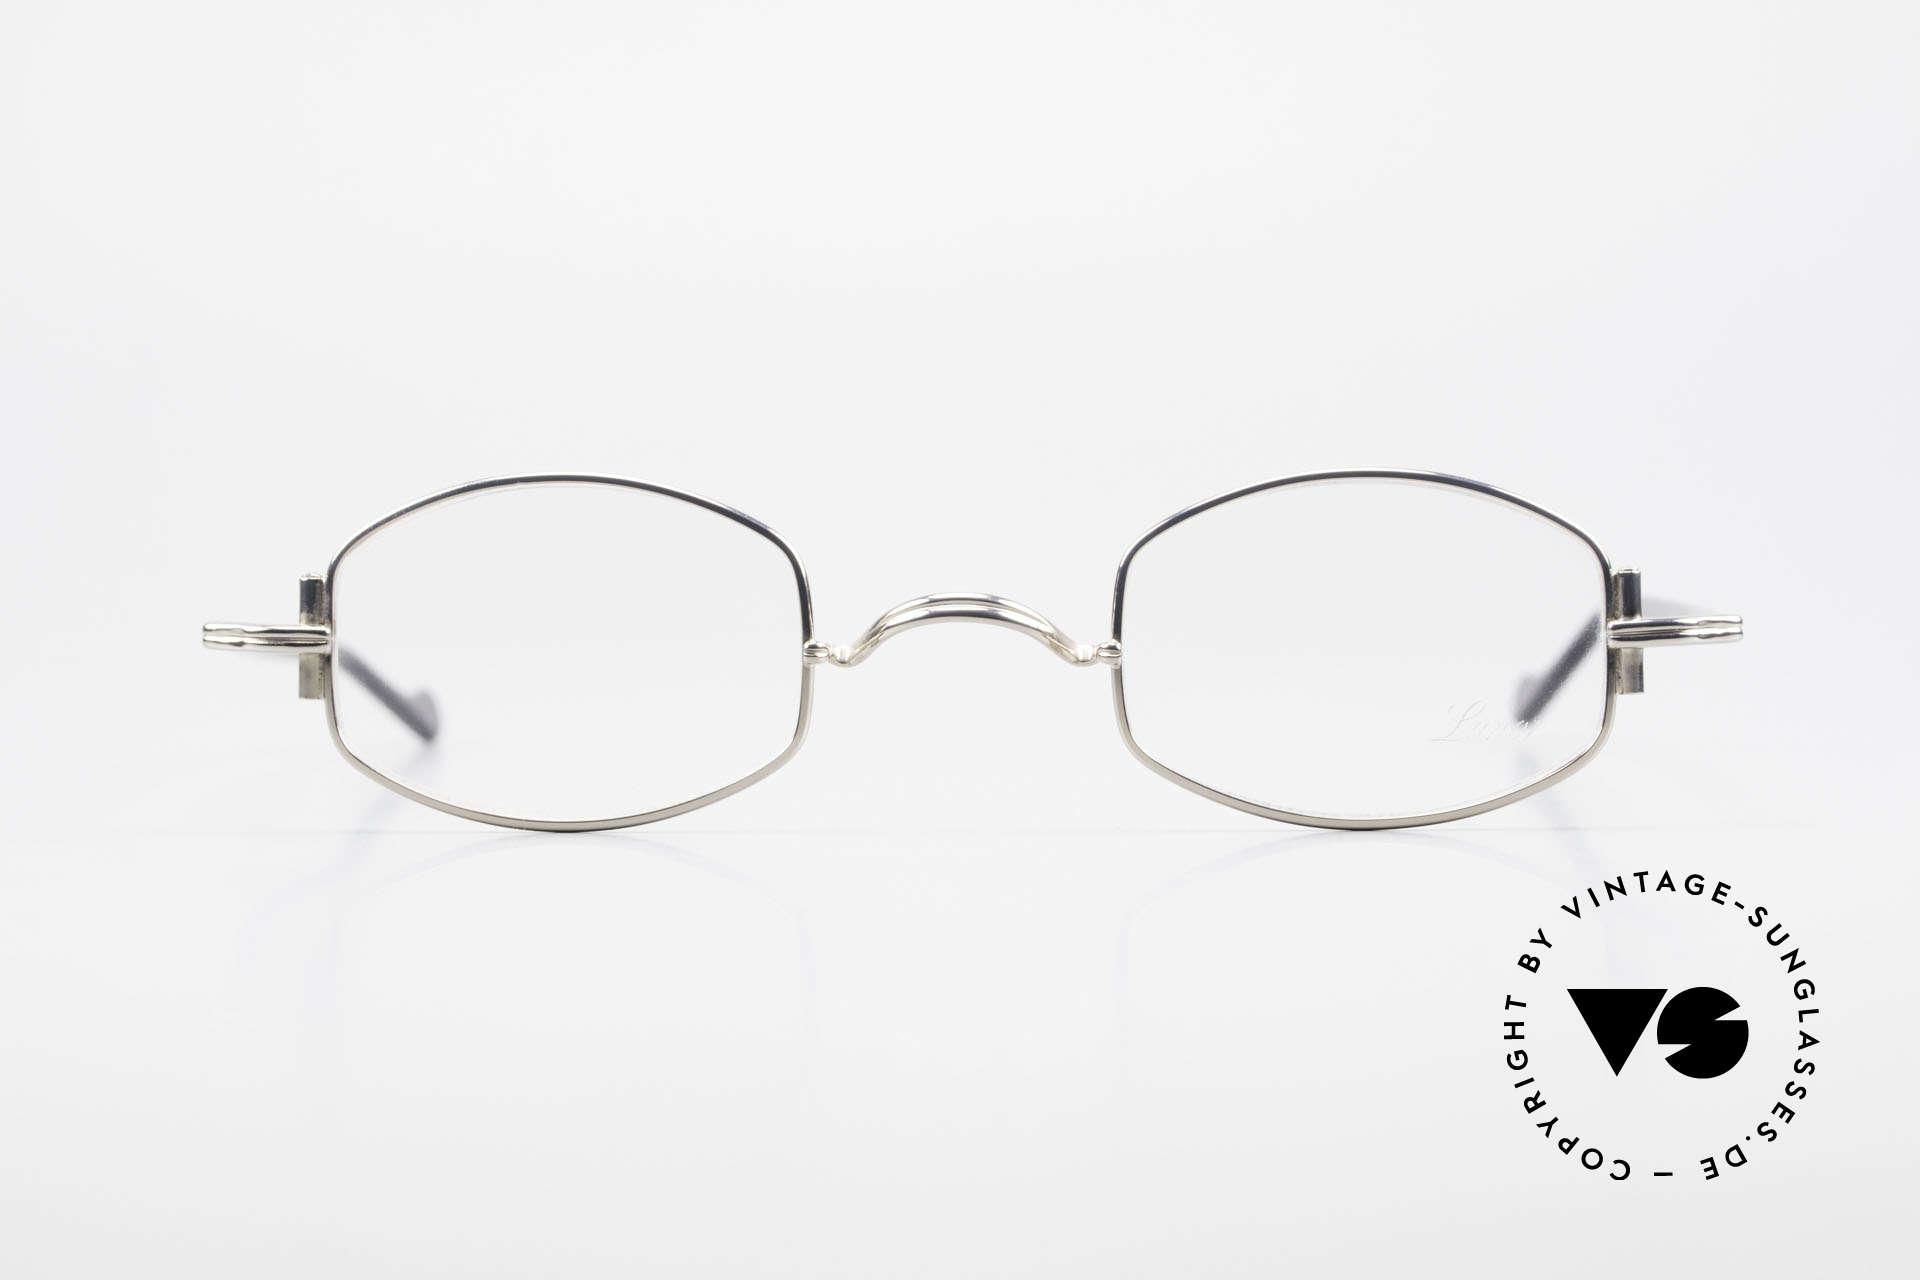 Lunor XA 03 No Retro Lunor Glasses Vintage, LUNOR = a traditional German brand (handmade quality), Made for Men and Women